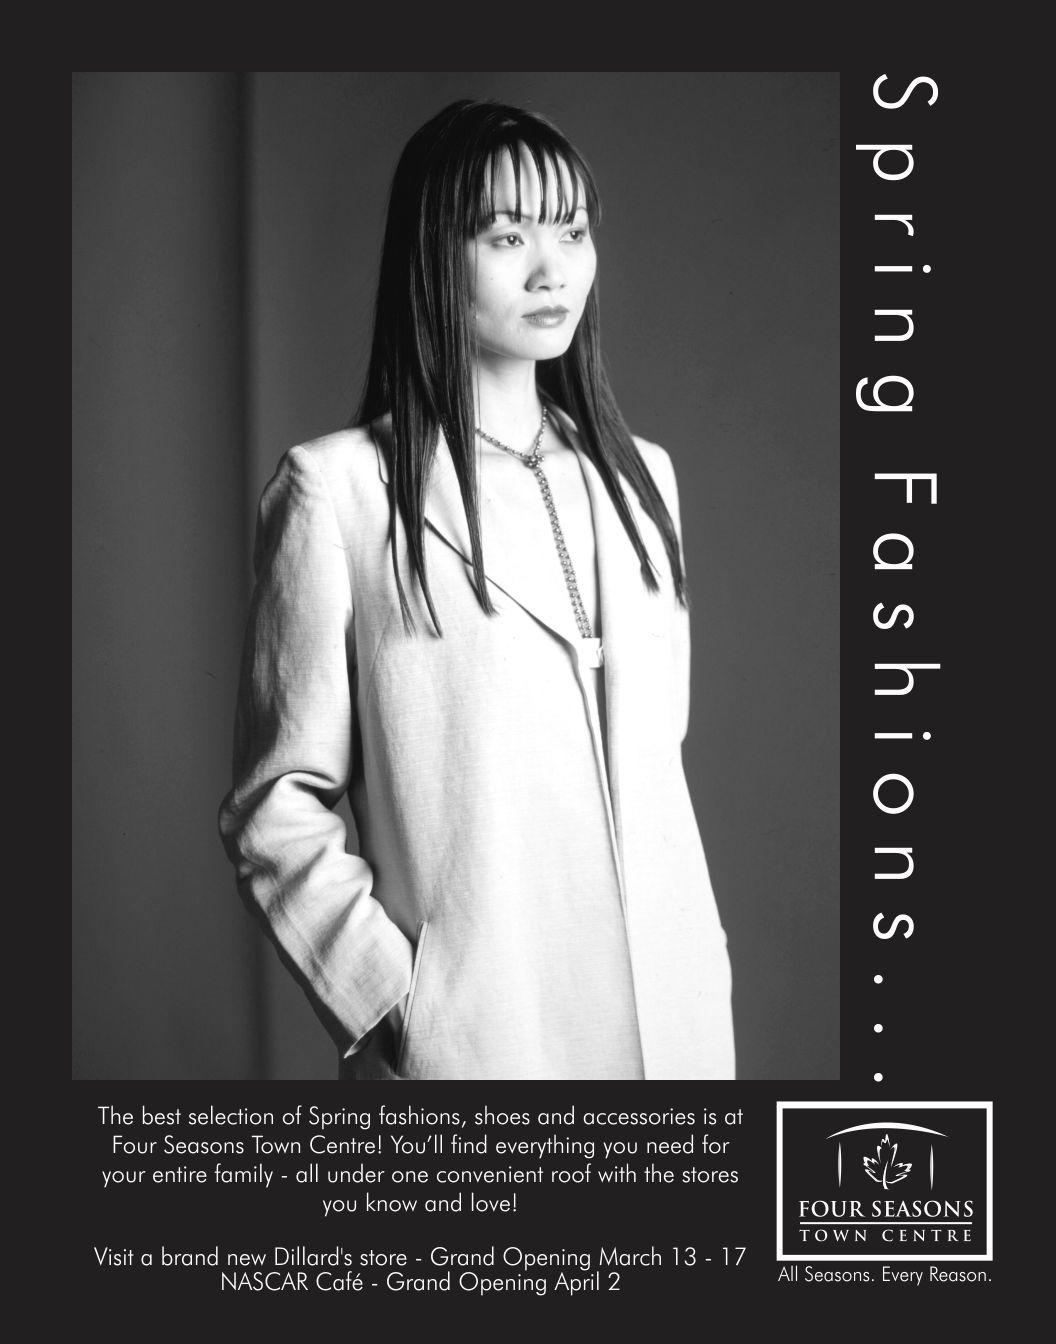 Four Season Spring Fashion ad | Design by Cybergarph of Raleigh